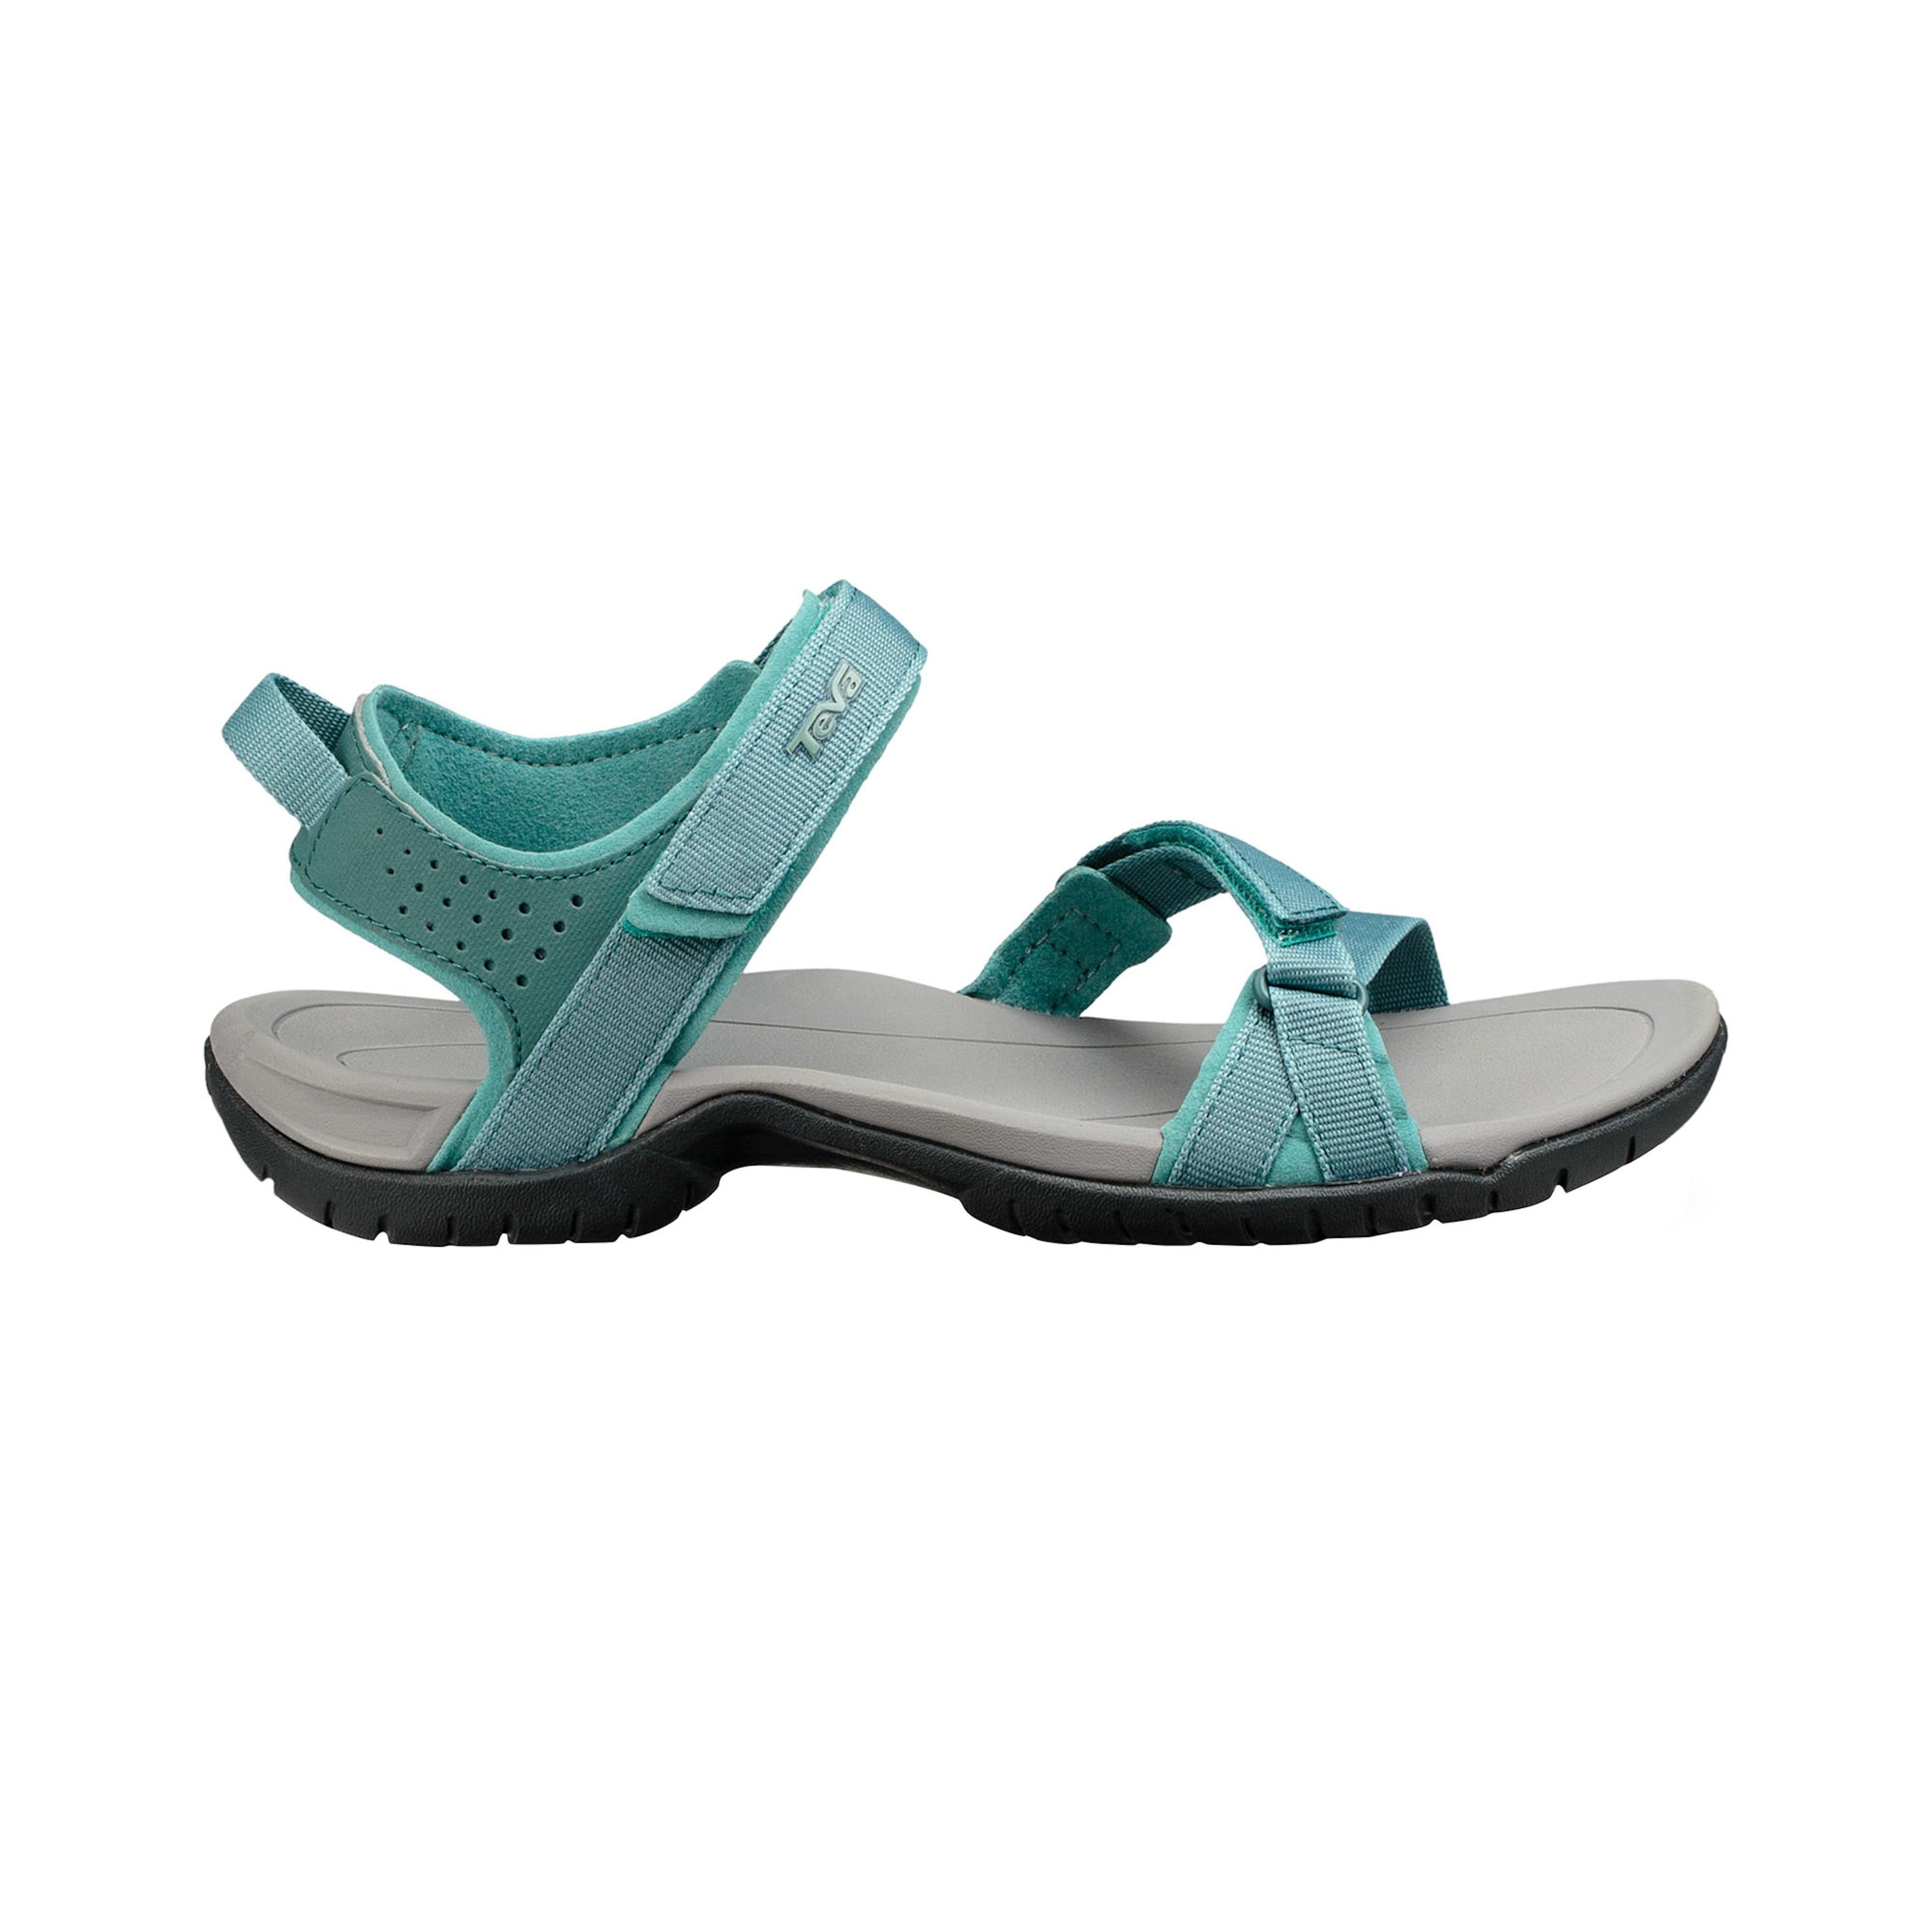 bf2cc564f70d Teva Verra Women s Sandals - Black